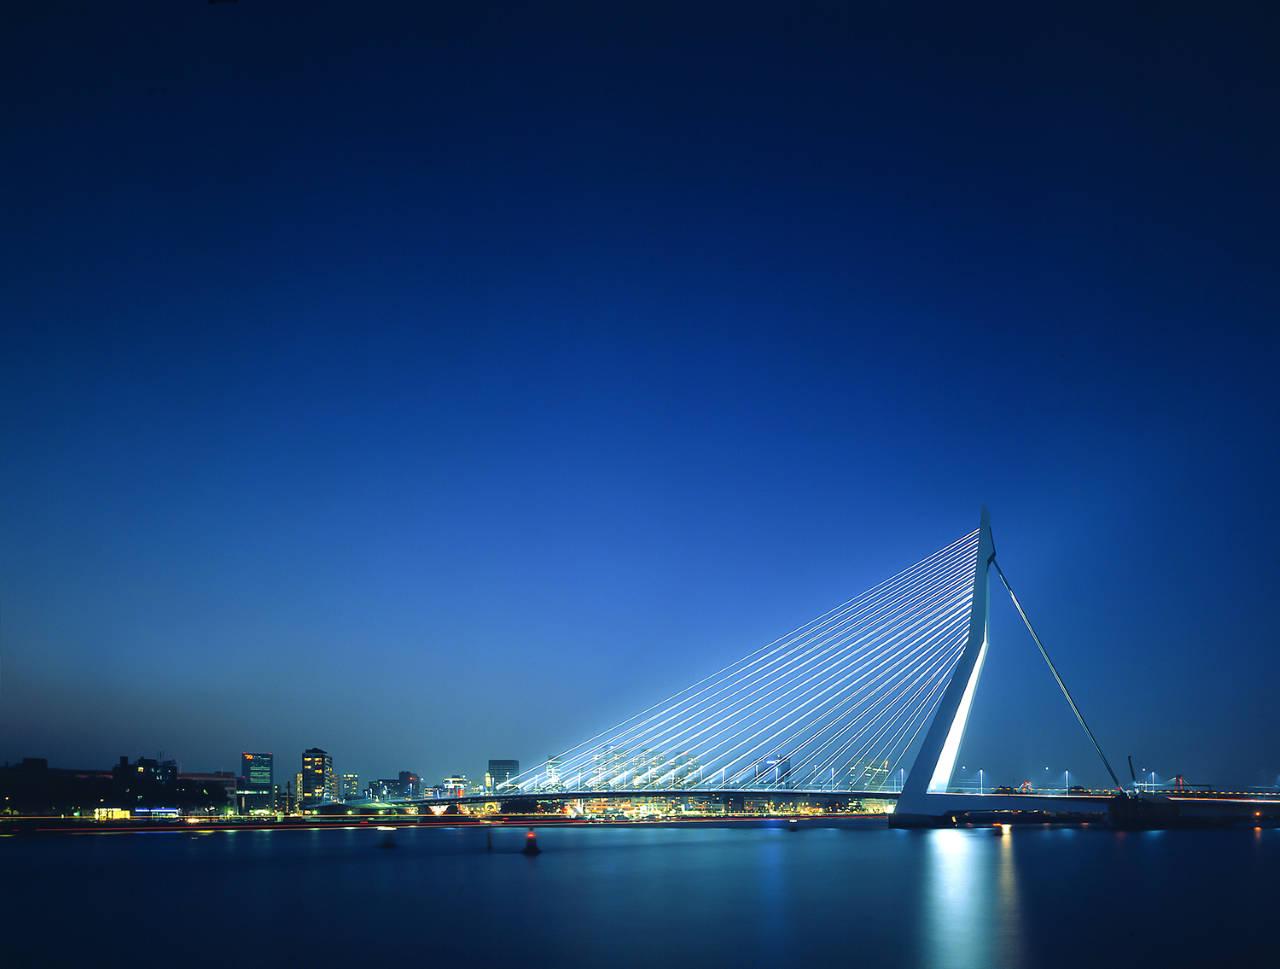 Erasmus Bridge, Holanda 1990-1996 by UNStudio : Photo credit © Christian Richters